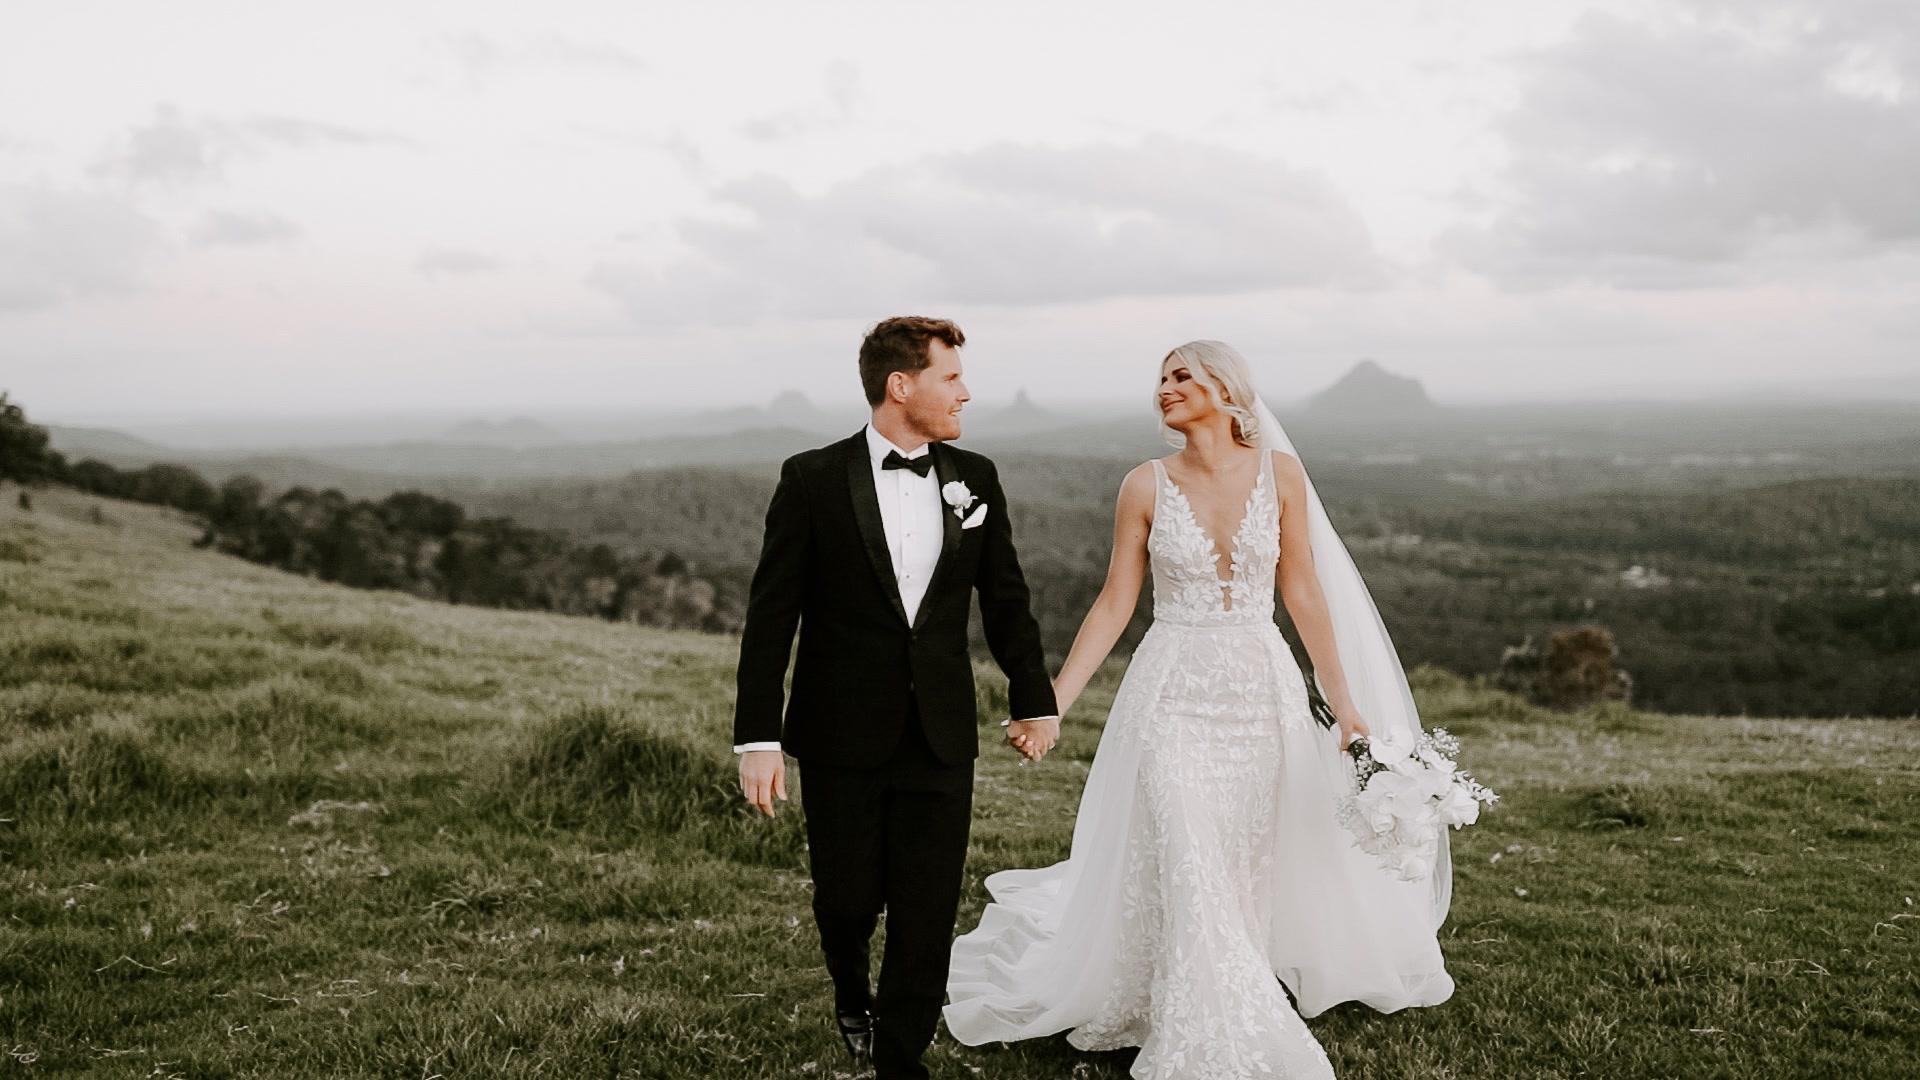 Kirsty + Jack | Maleny, Australia | Maleny Manor